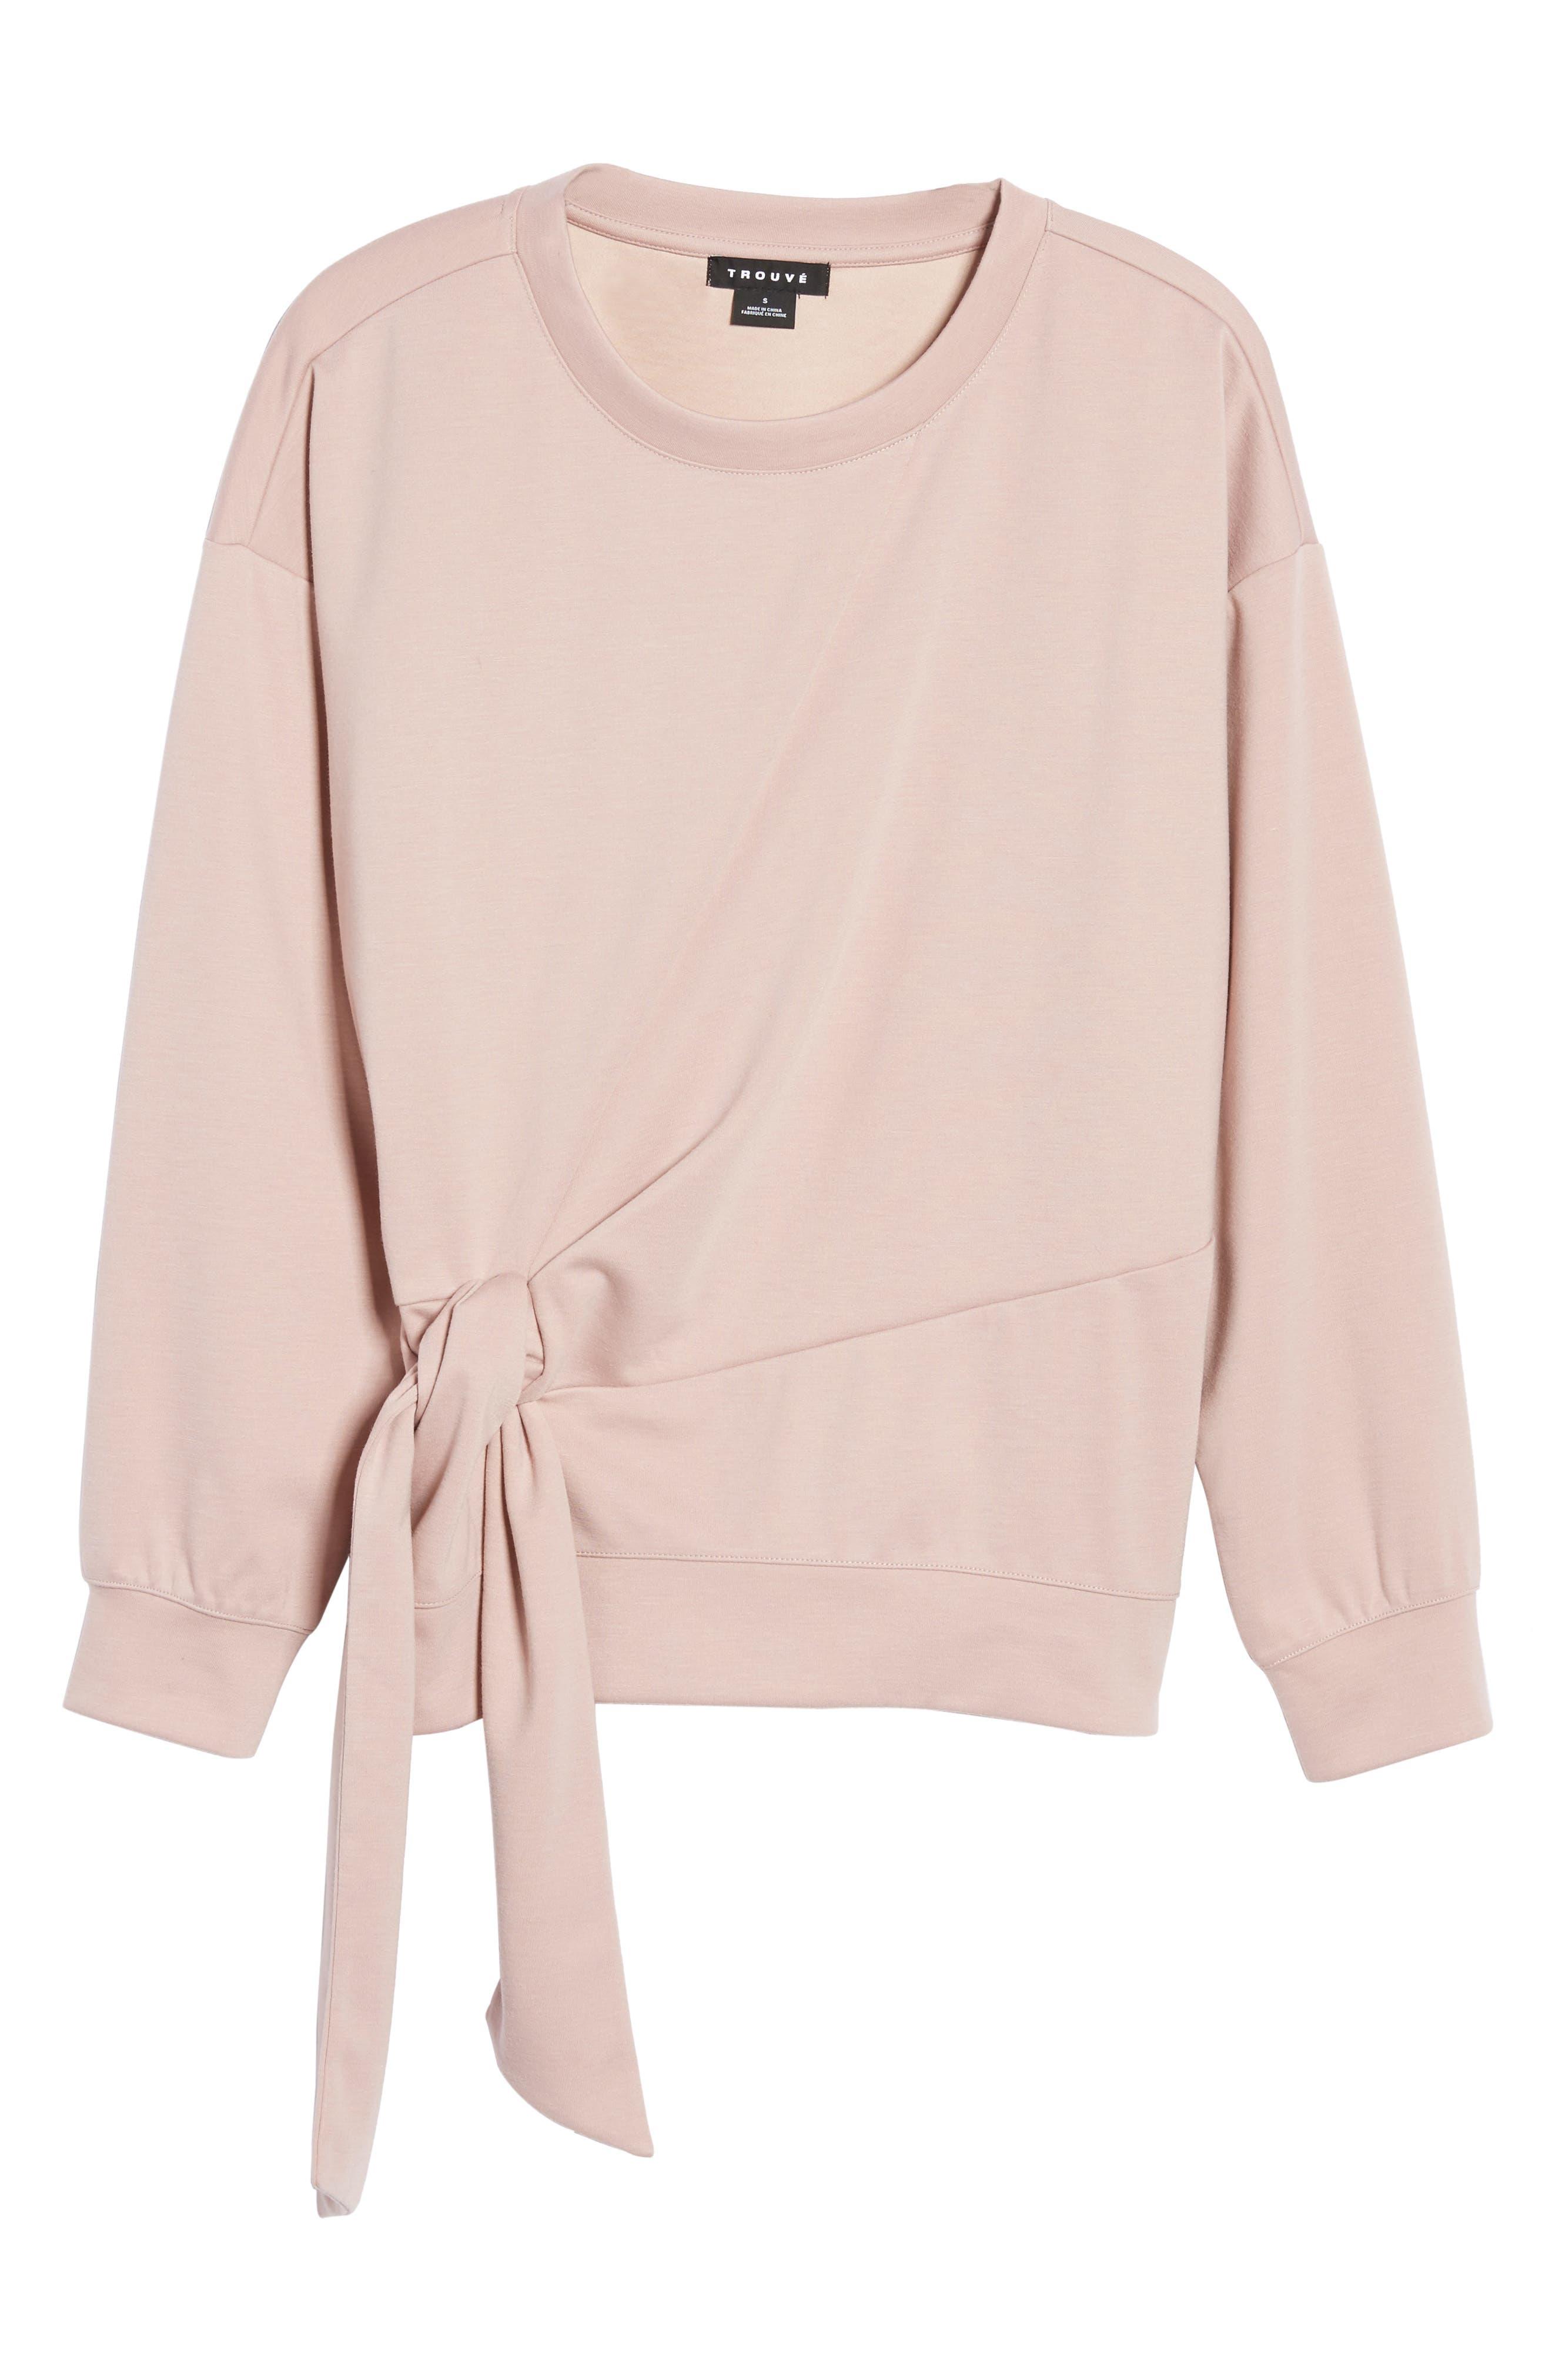 Tie Front Sweatshirt,                             Alternate thumbnail 6, color,                             Pink Adobe